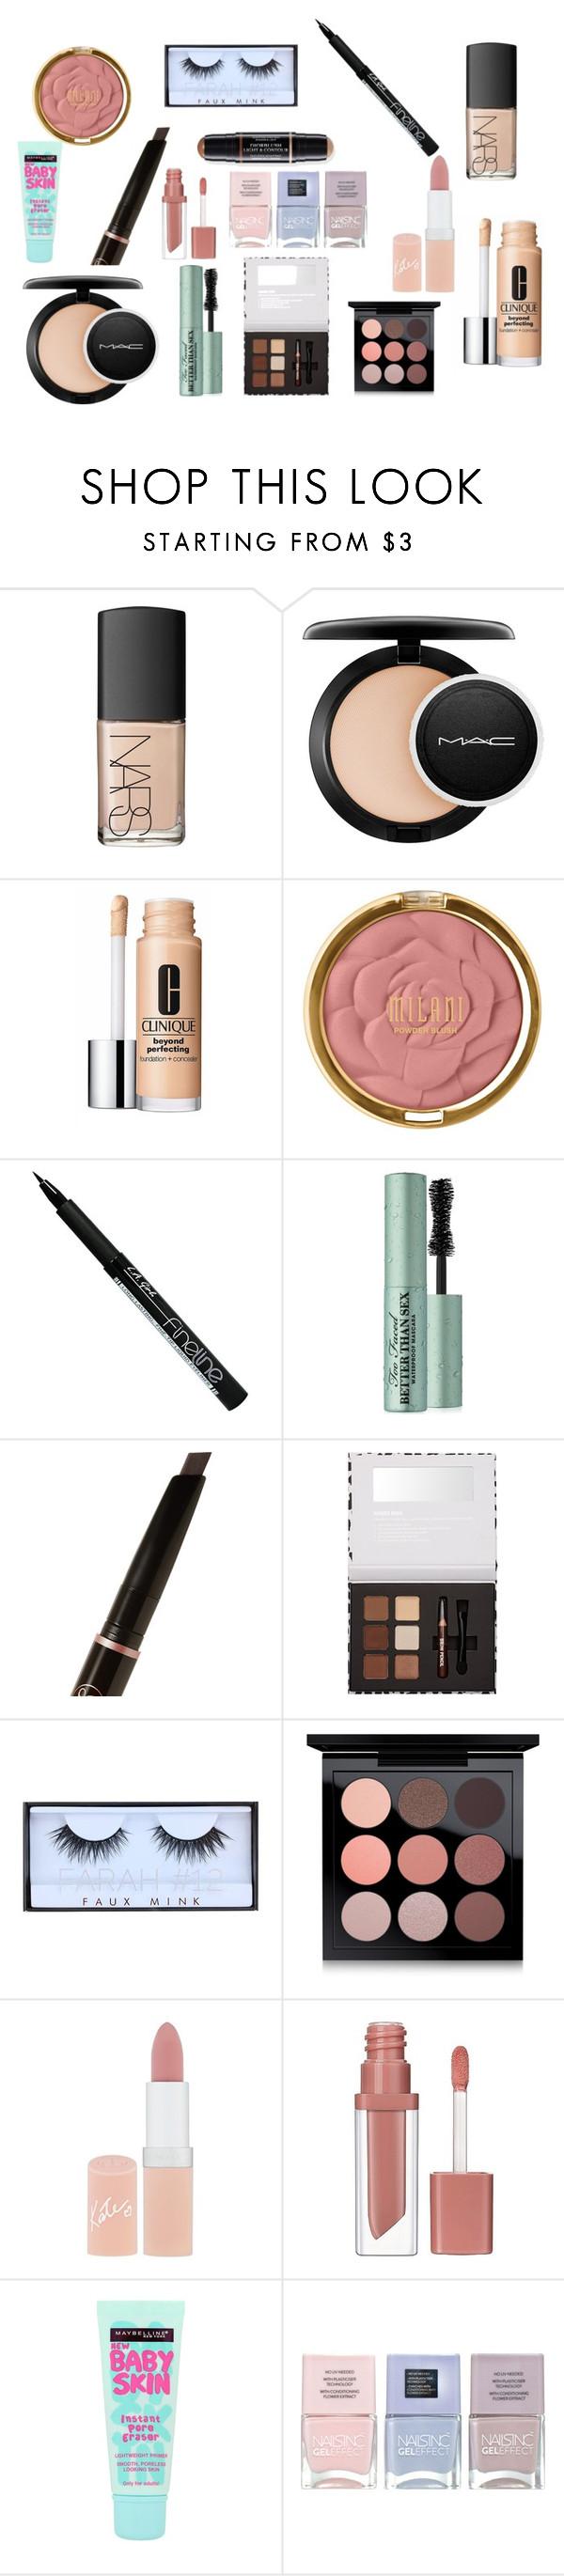 """Daily makeup"" by mrslexluthorloki on Polyvore featuring beauty, NARS Cosmetics, MAC Cosmetics, Clinique, Milani, Too Faced Cosmetics, Anastasia Beverly Hills, Huda Beauty, Rimmel and Essence"